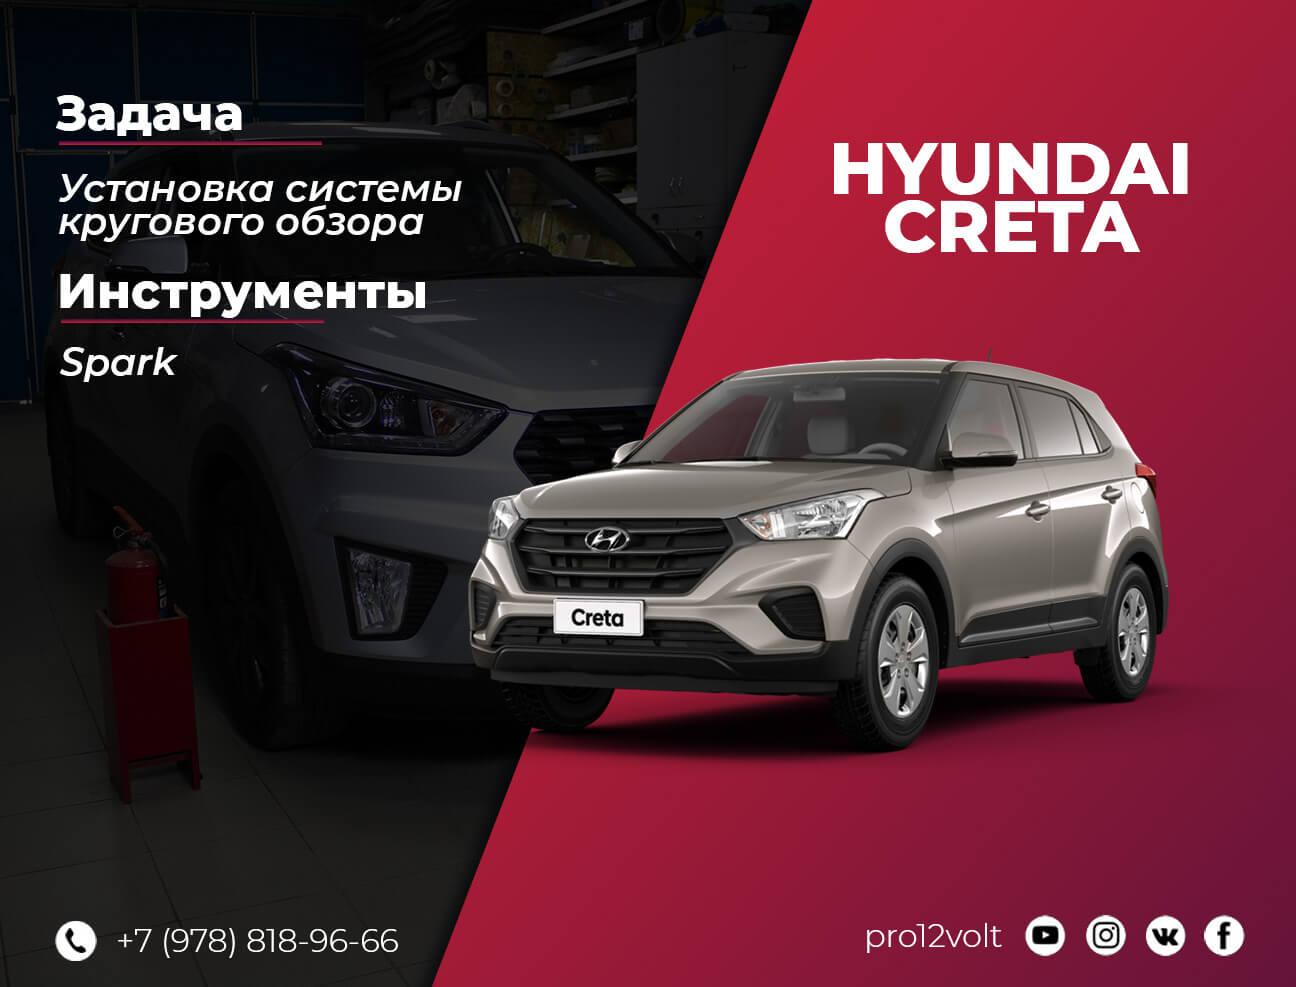 Hyundai Creta – 2020